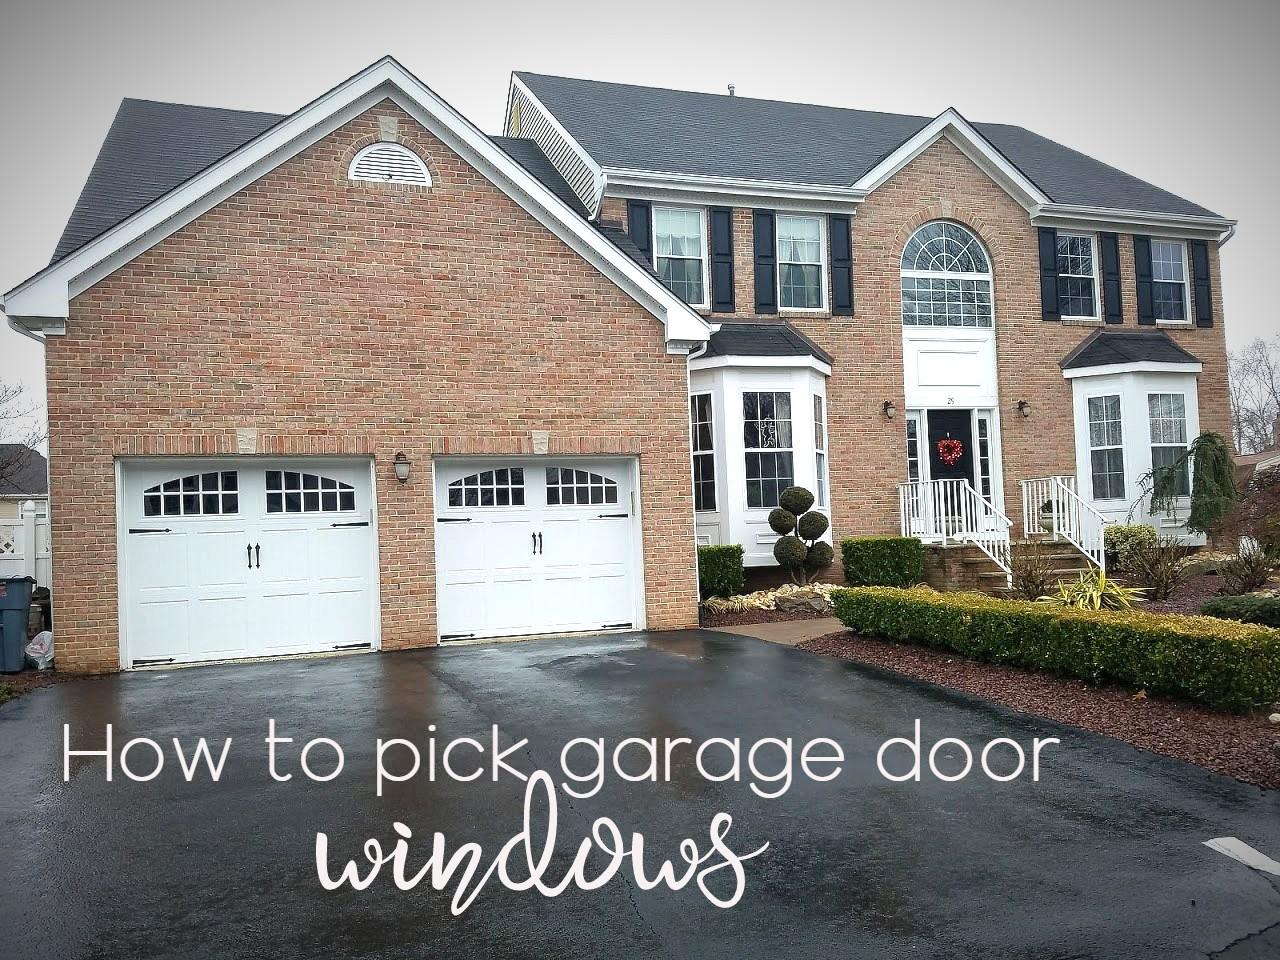 how to pick garage door windows;residential garage door window style guide; selecting garage door window suggestions